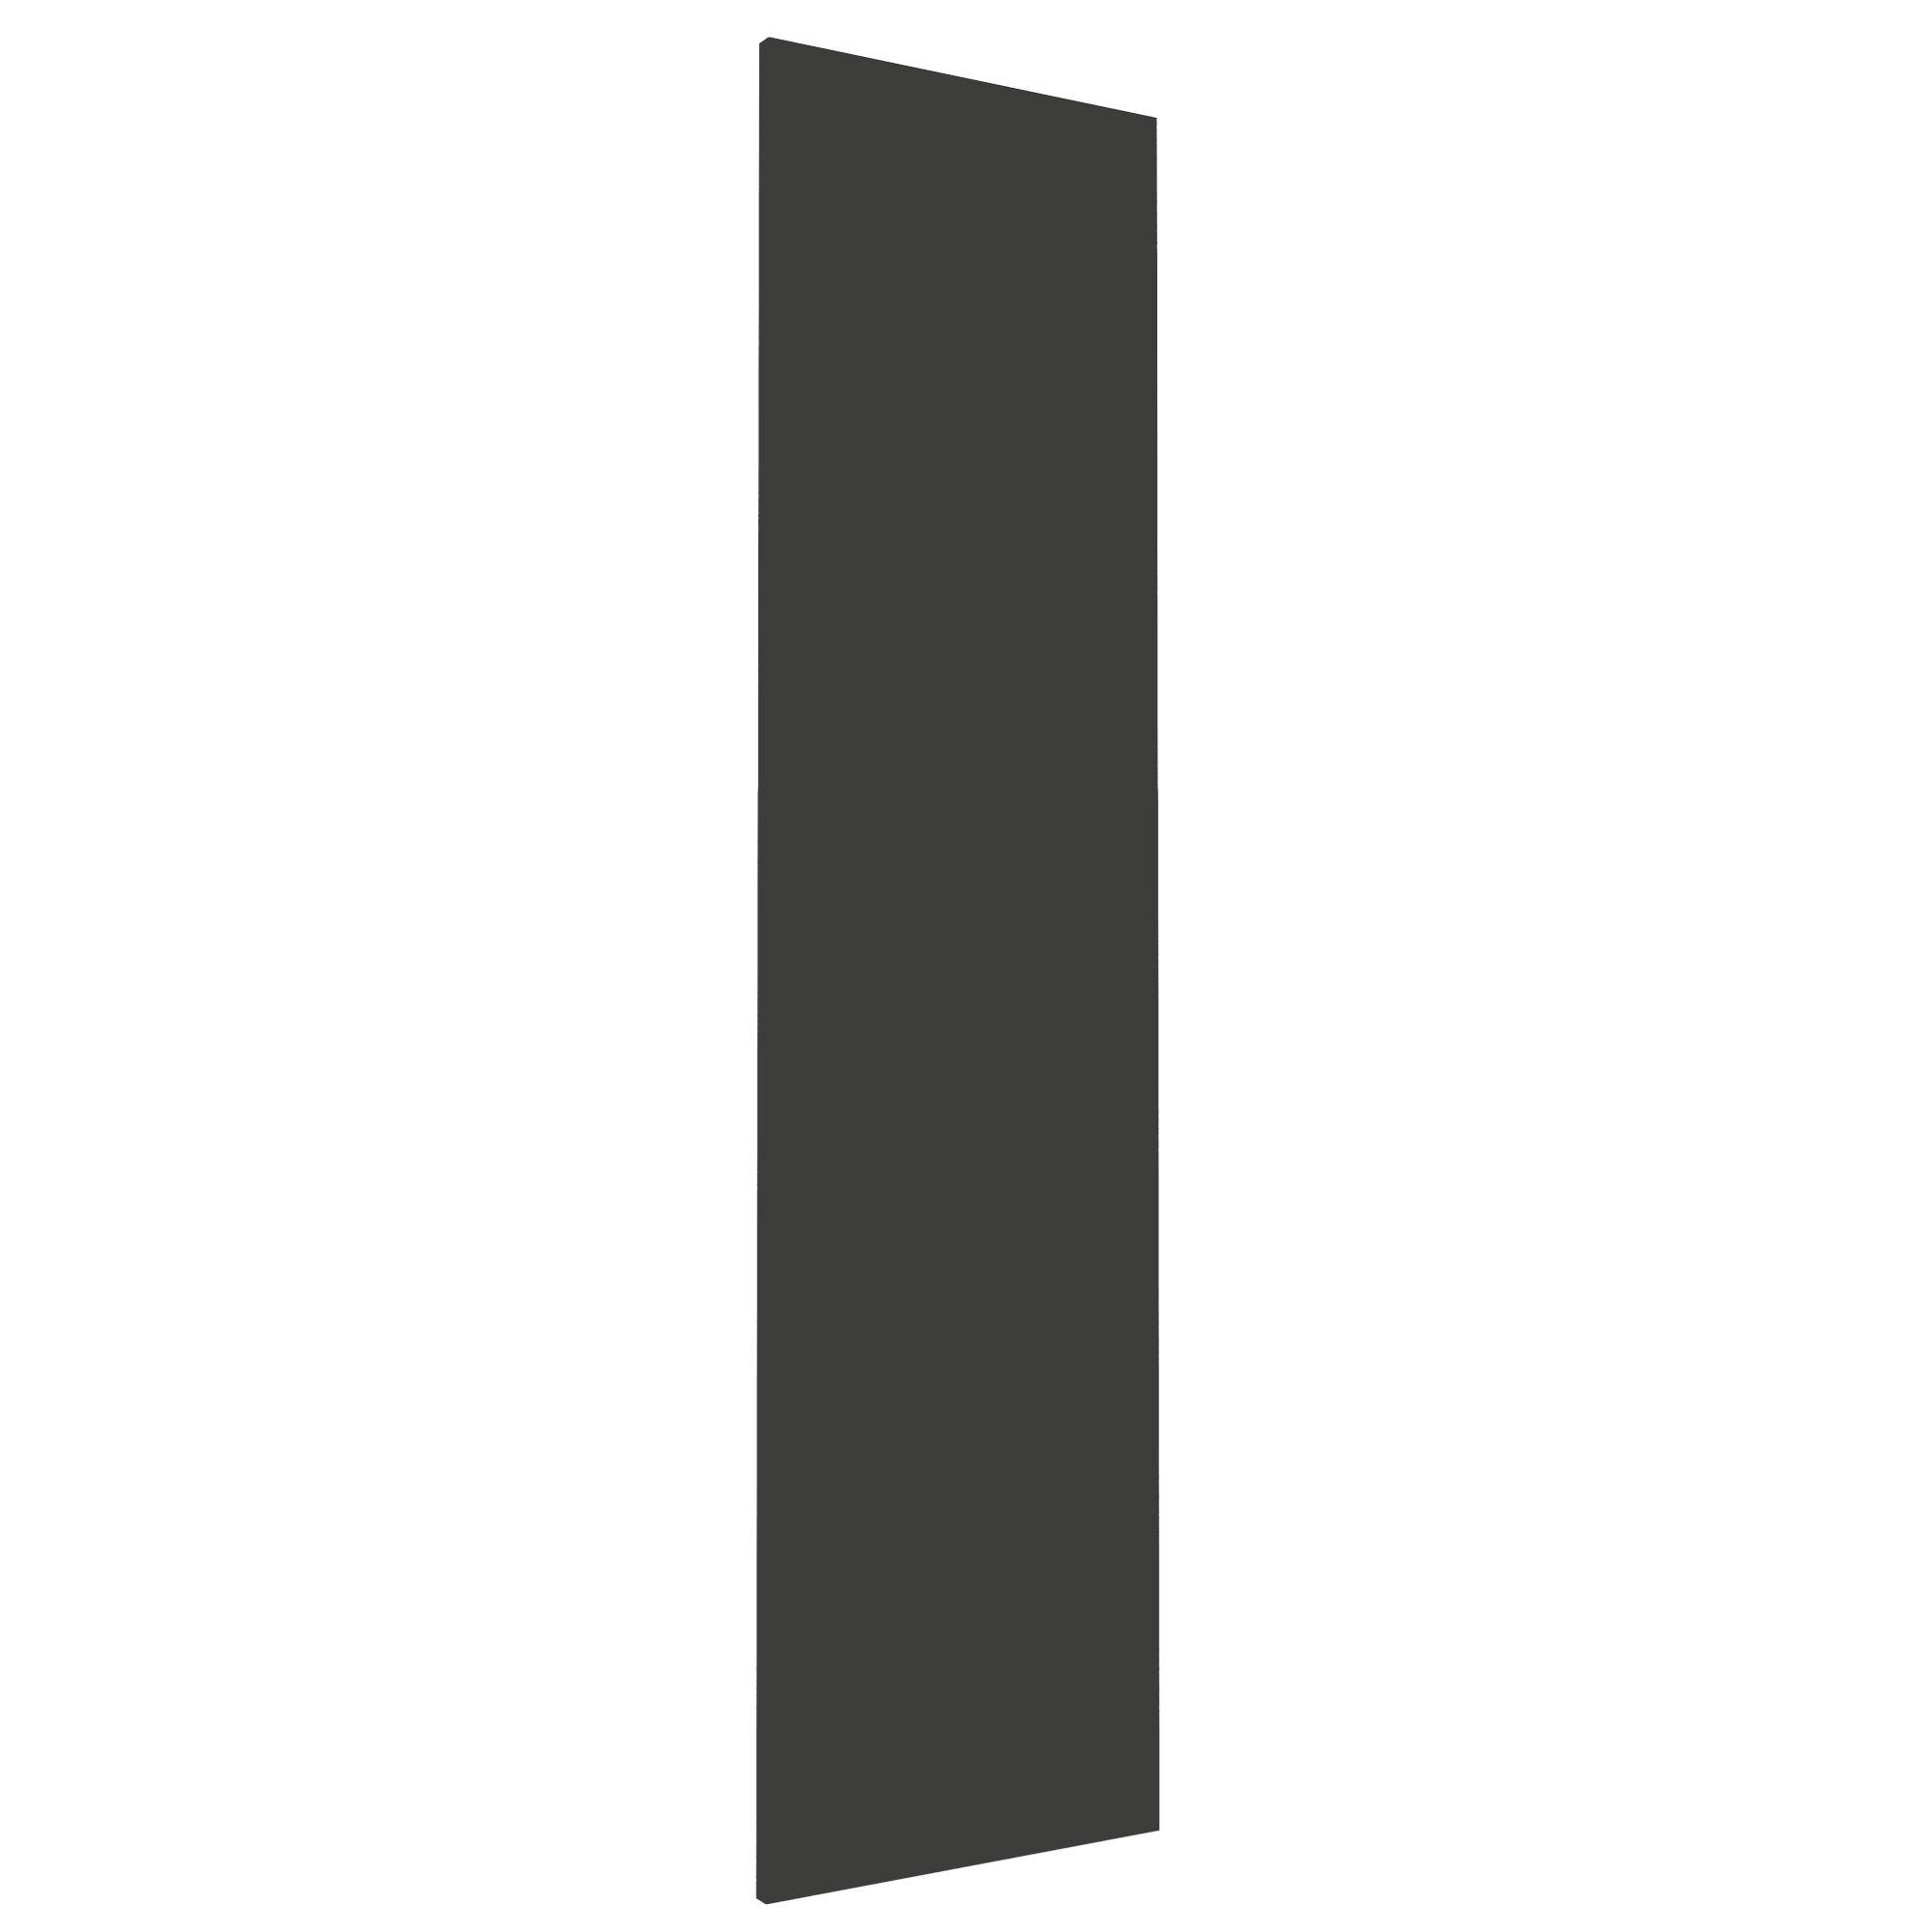 Darwin Modular Anthracite & Gloss Wardrobe Door (h)1456mm (w)372mm (d)18mm